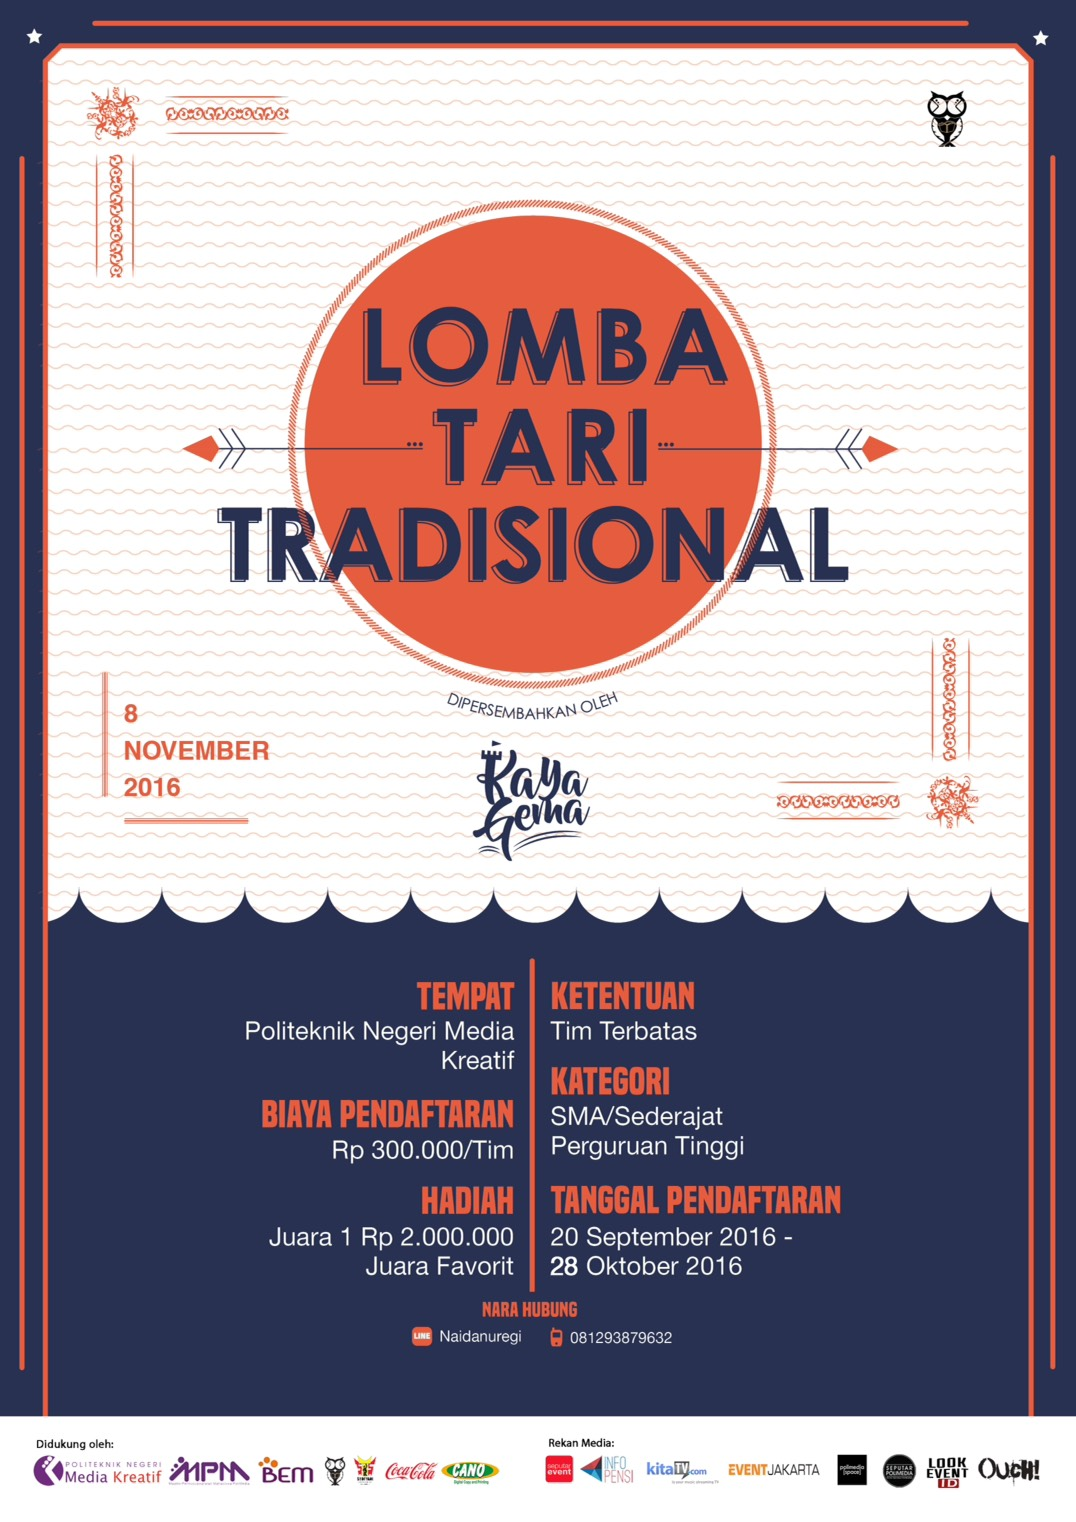 poster lomba tari tradisional kaya gema